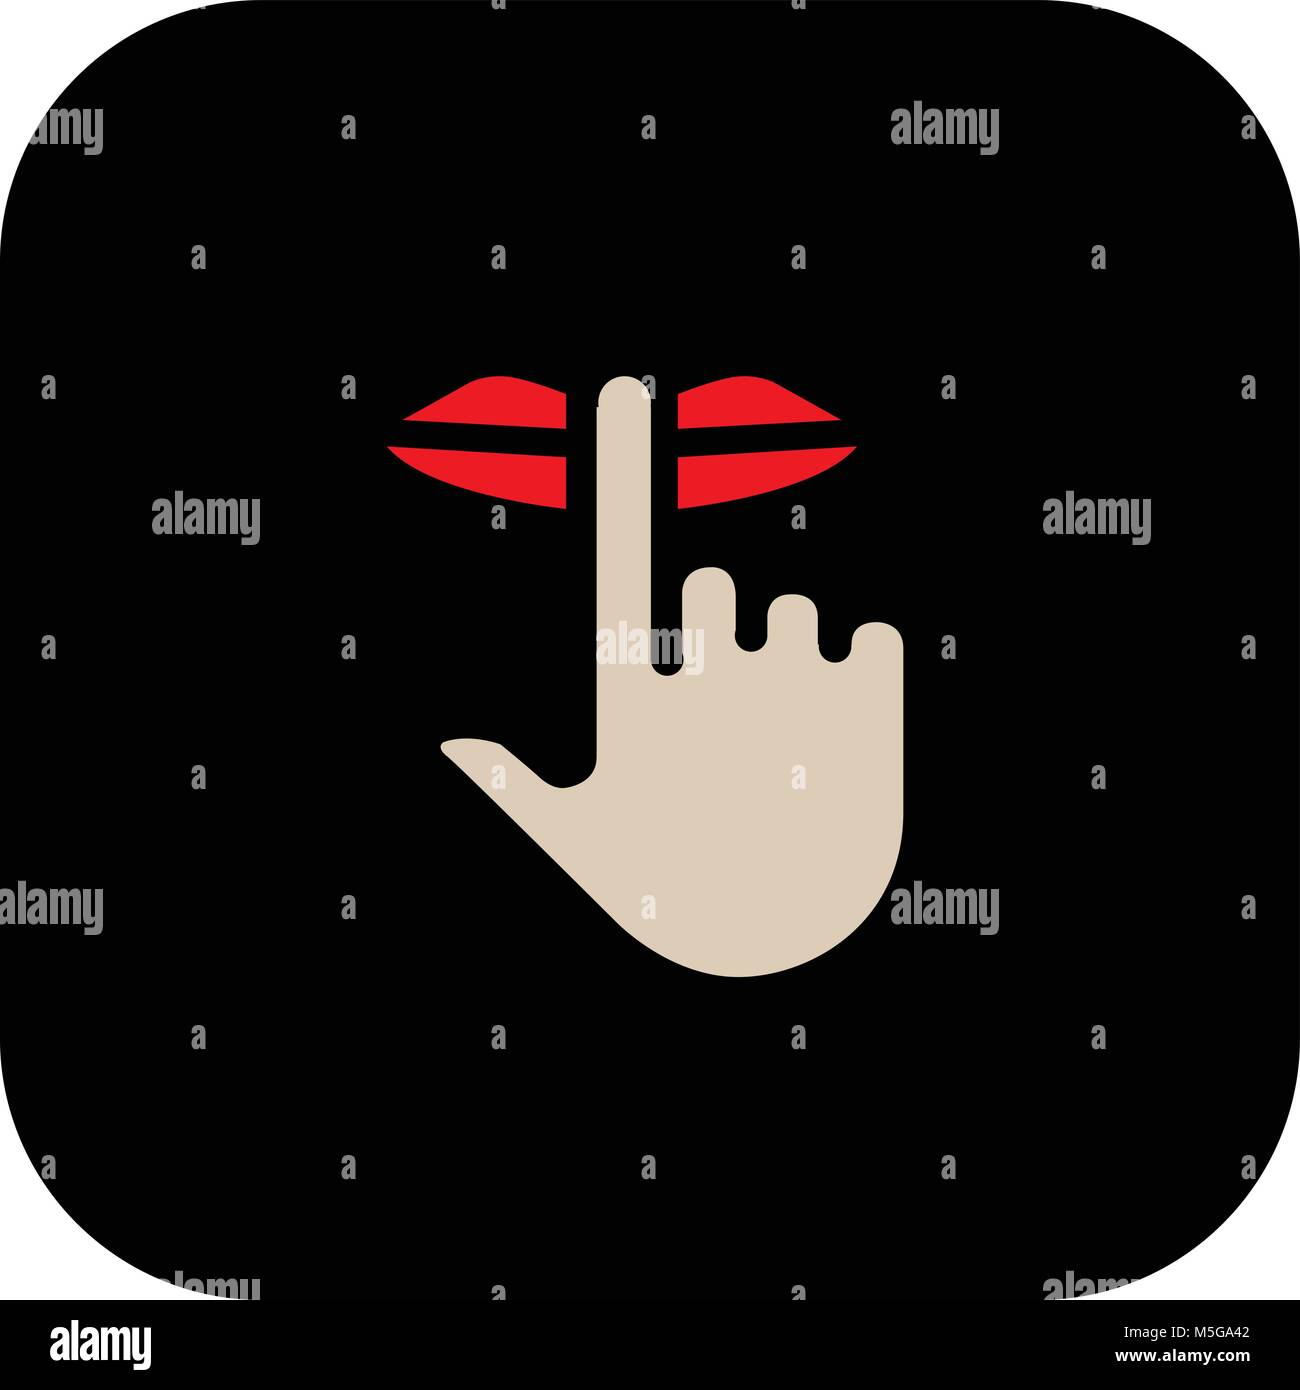 Be quiet sign vector illustration stock vector art illustration be quiet sign vector illustration buycottarizona